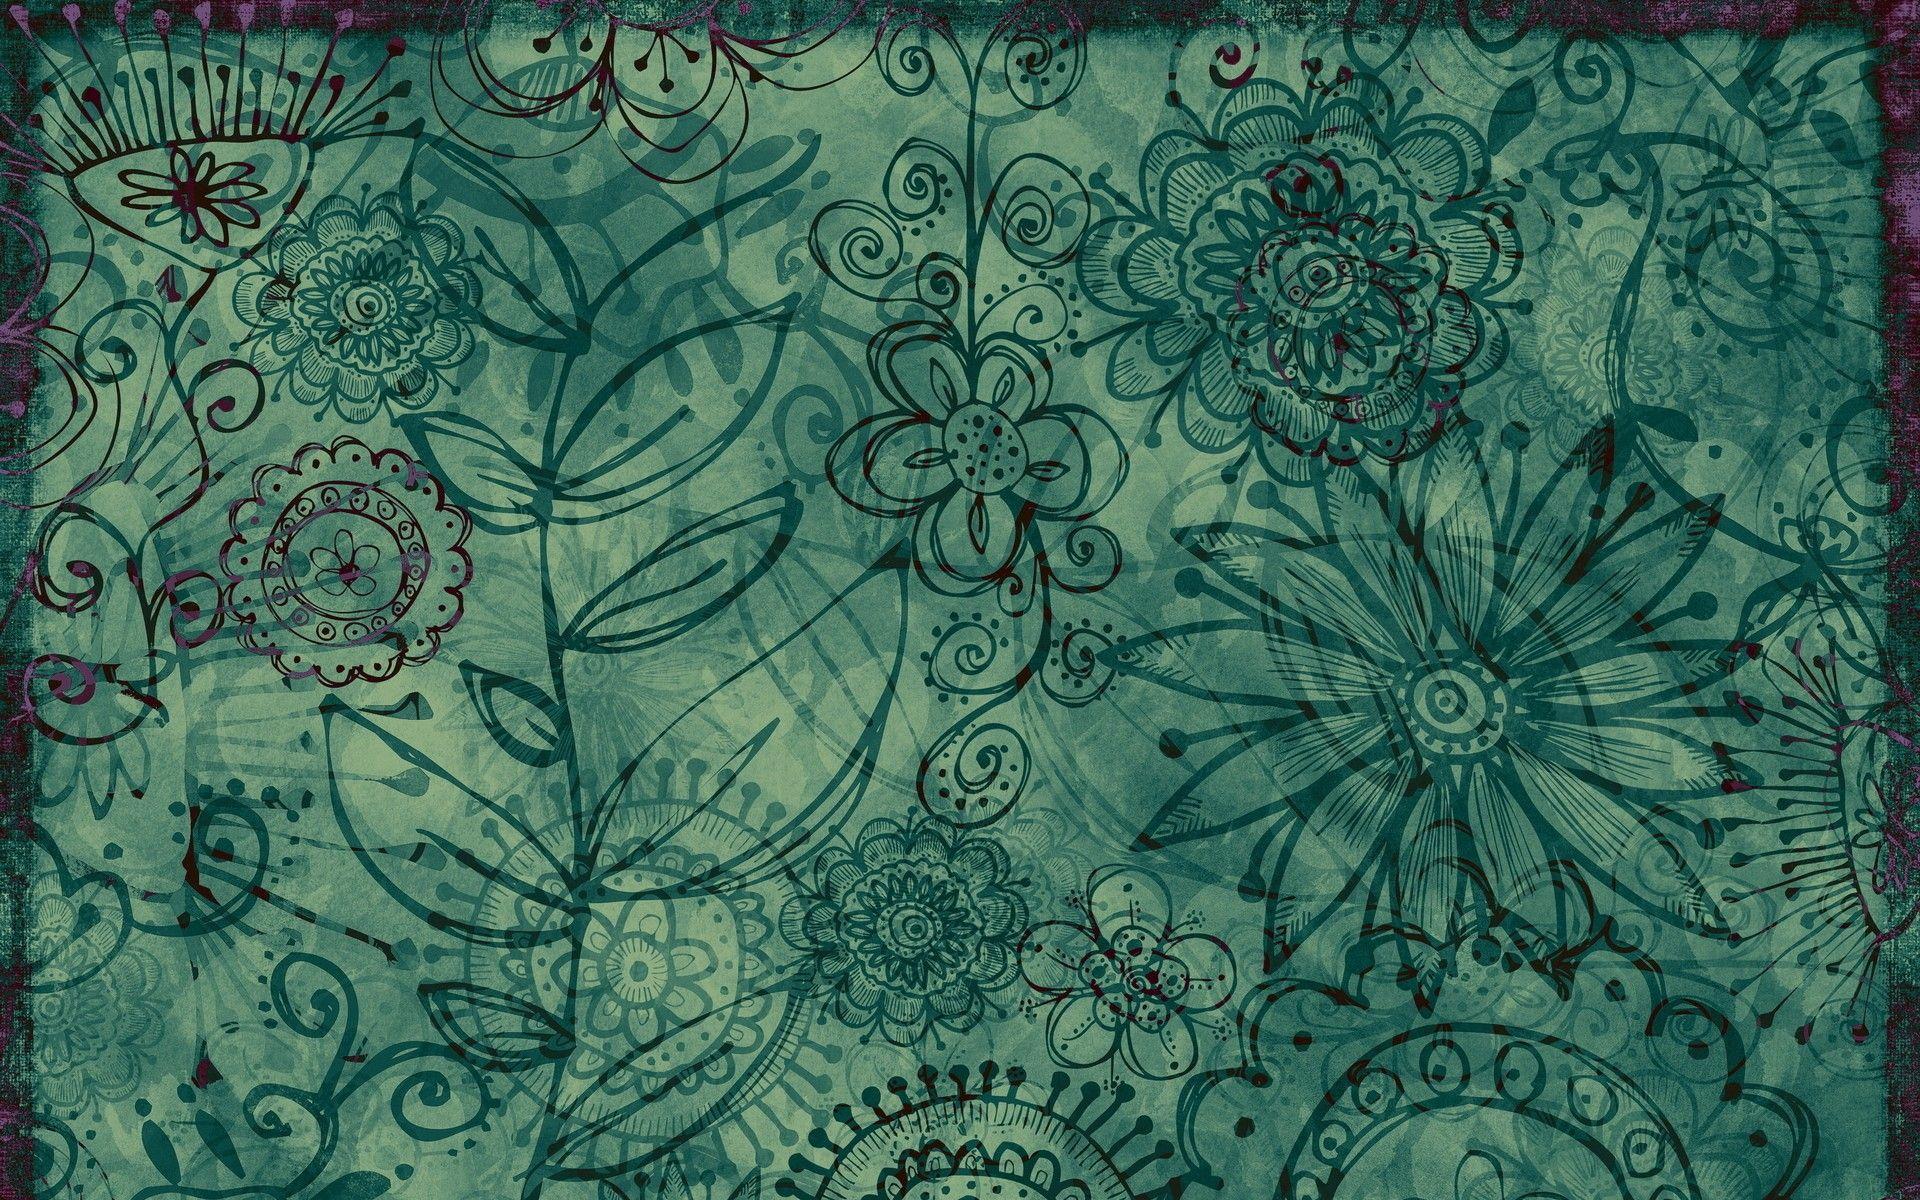 Hd Pattern Wallpapers Top Free Hd Pattern Backgrounds